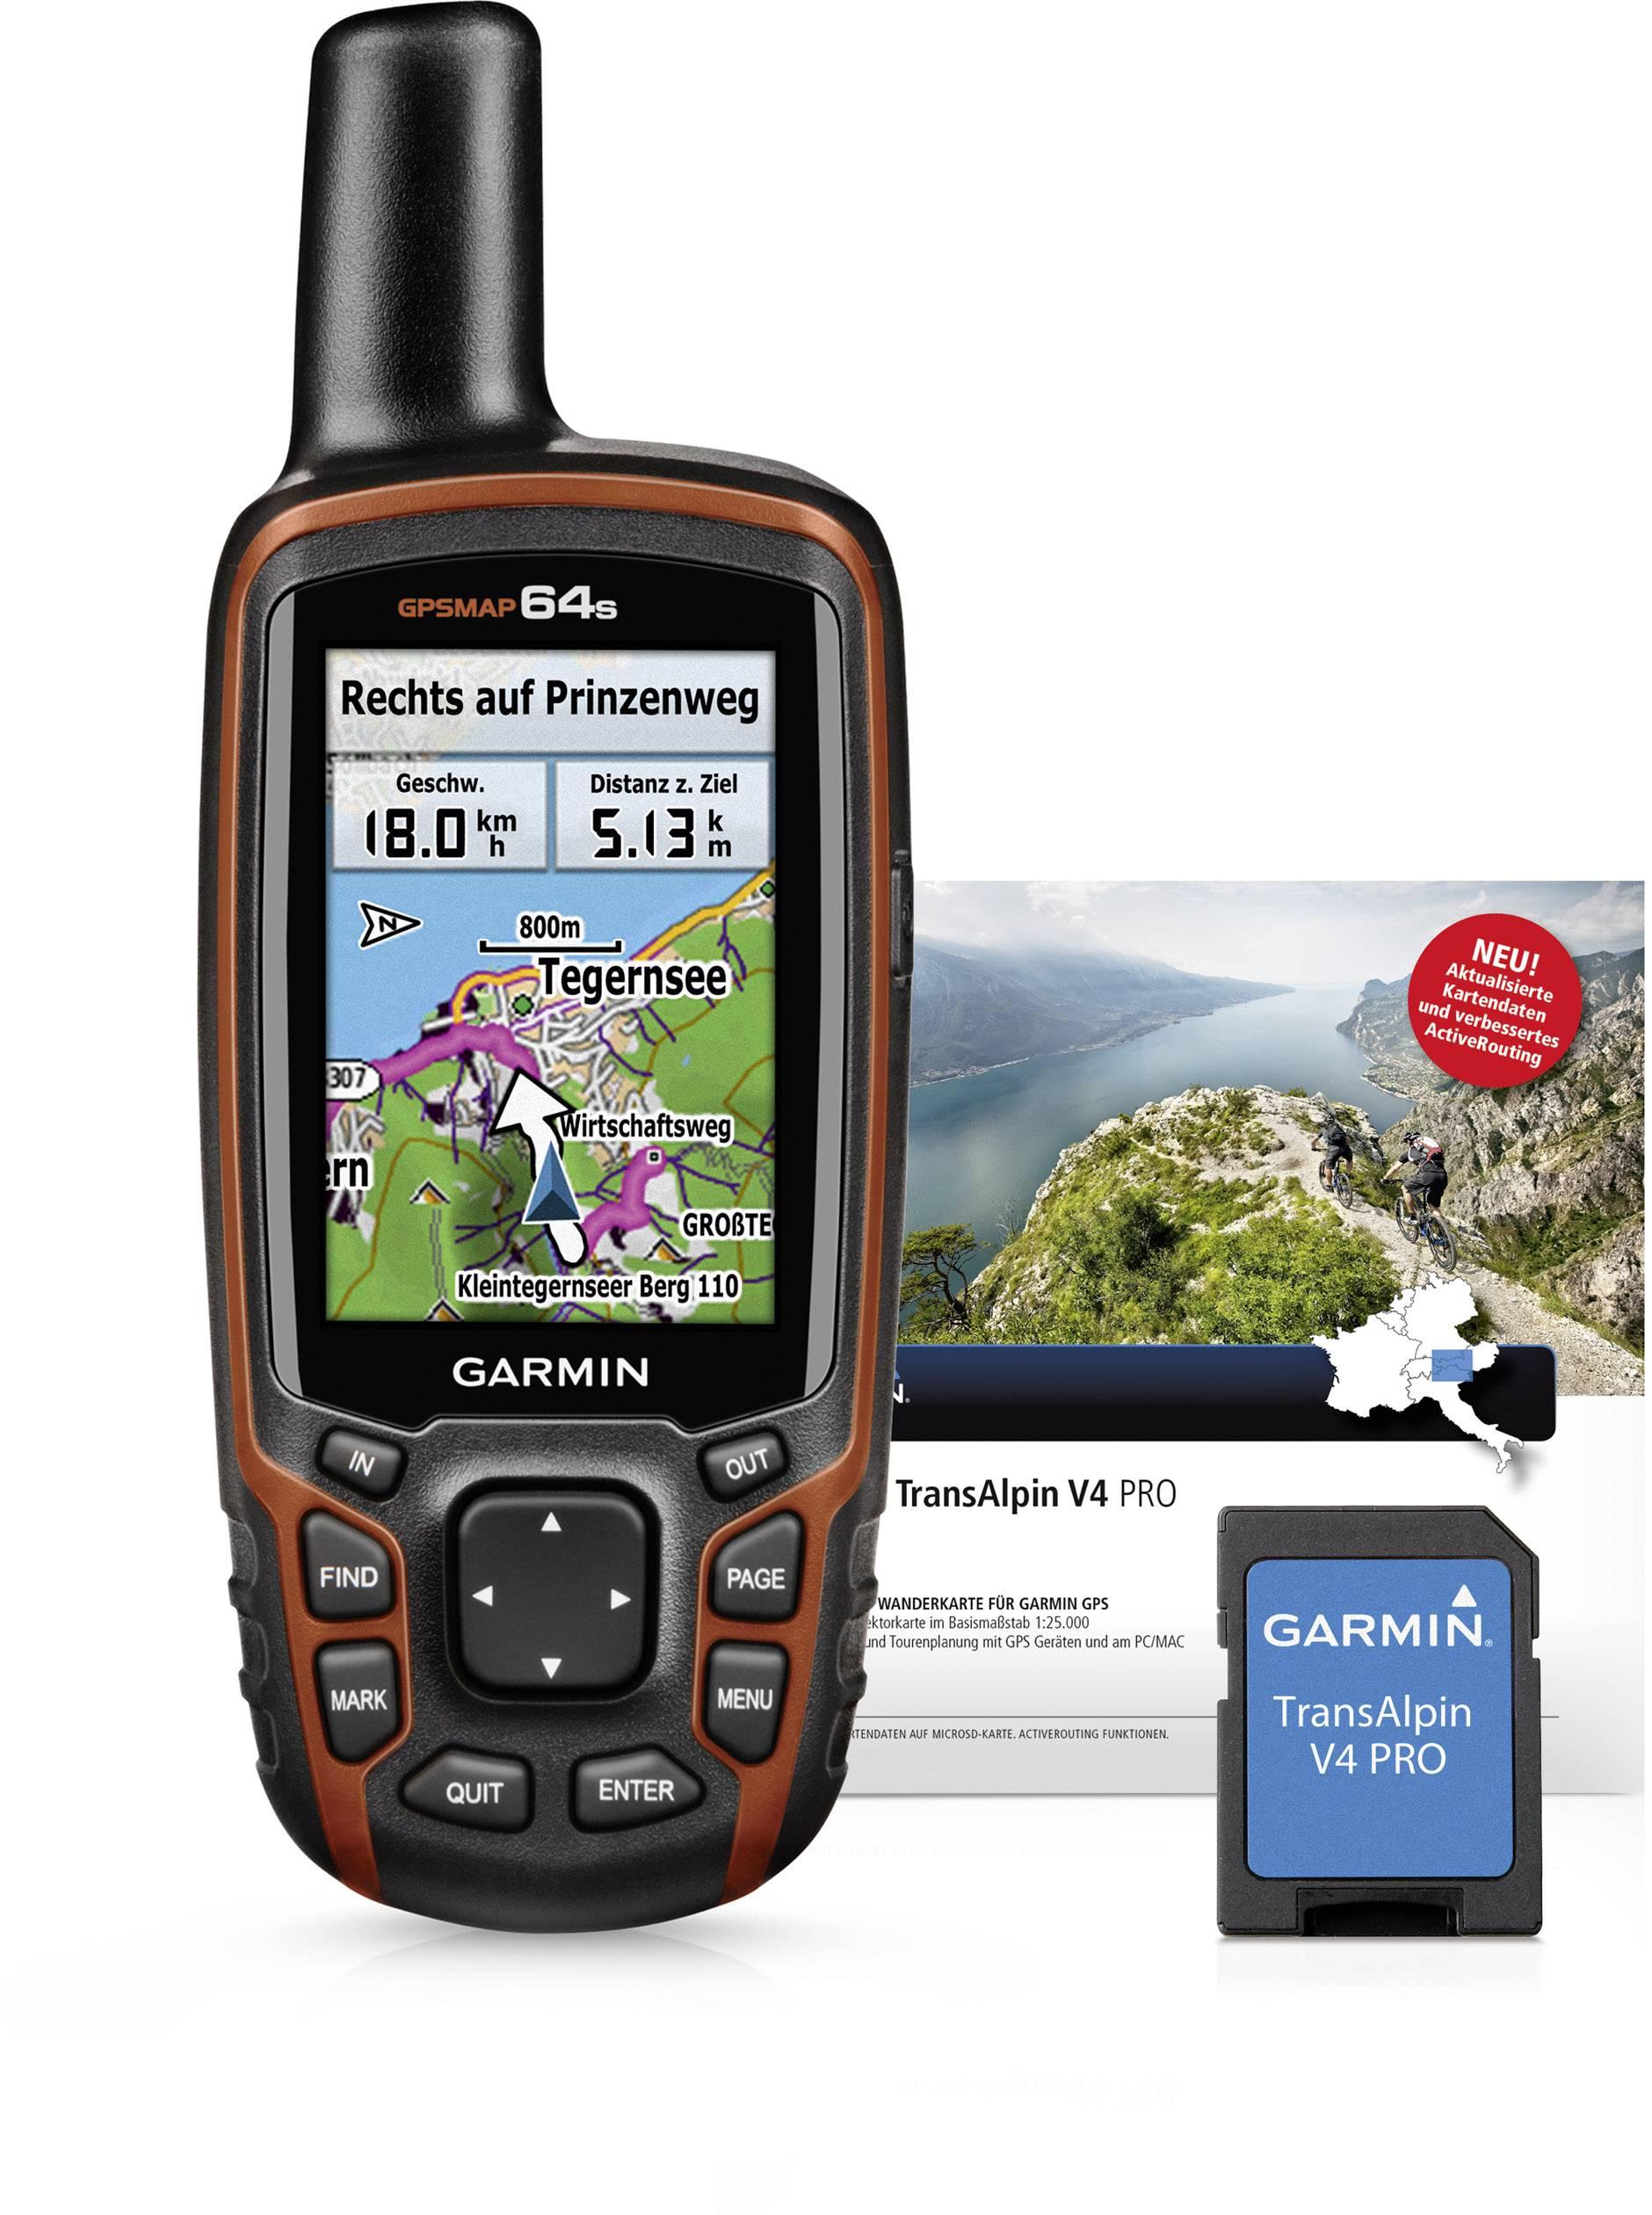 Garmin GPSMap 64s + TOPO Deutschland V8 Pro Outdoor GPS